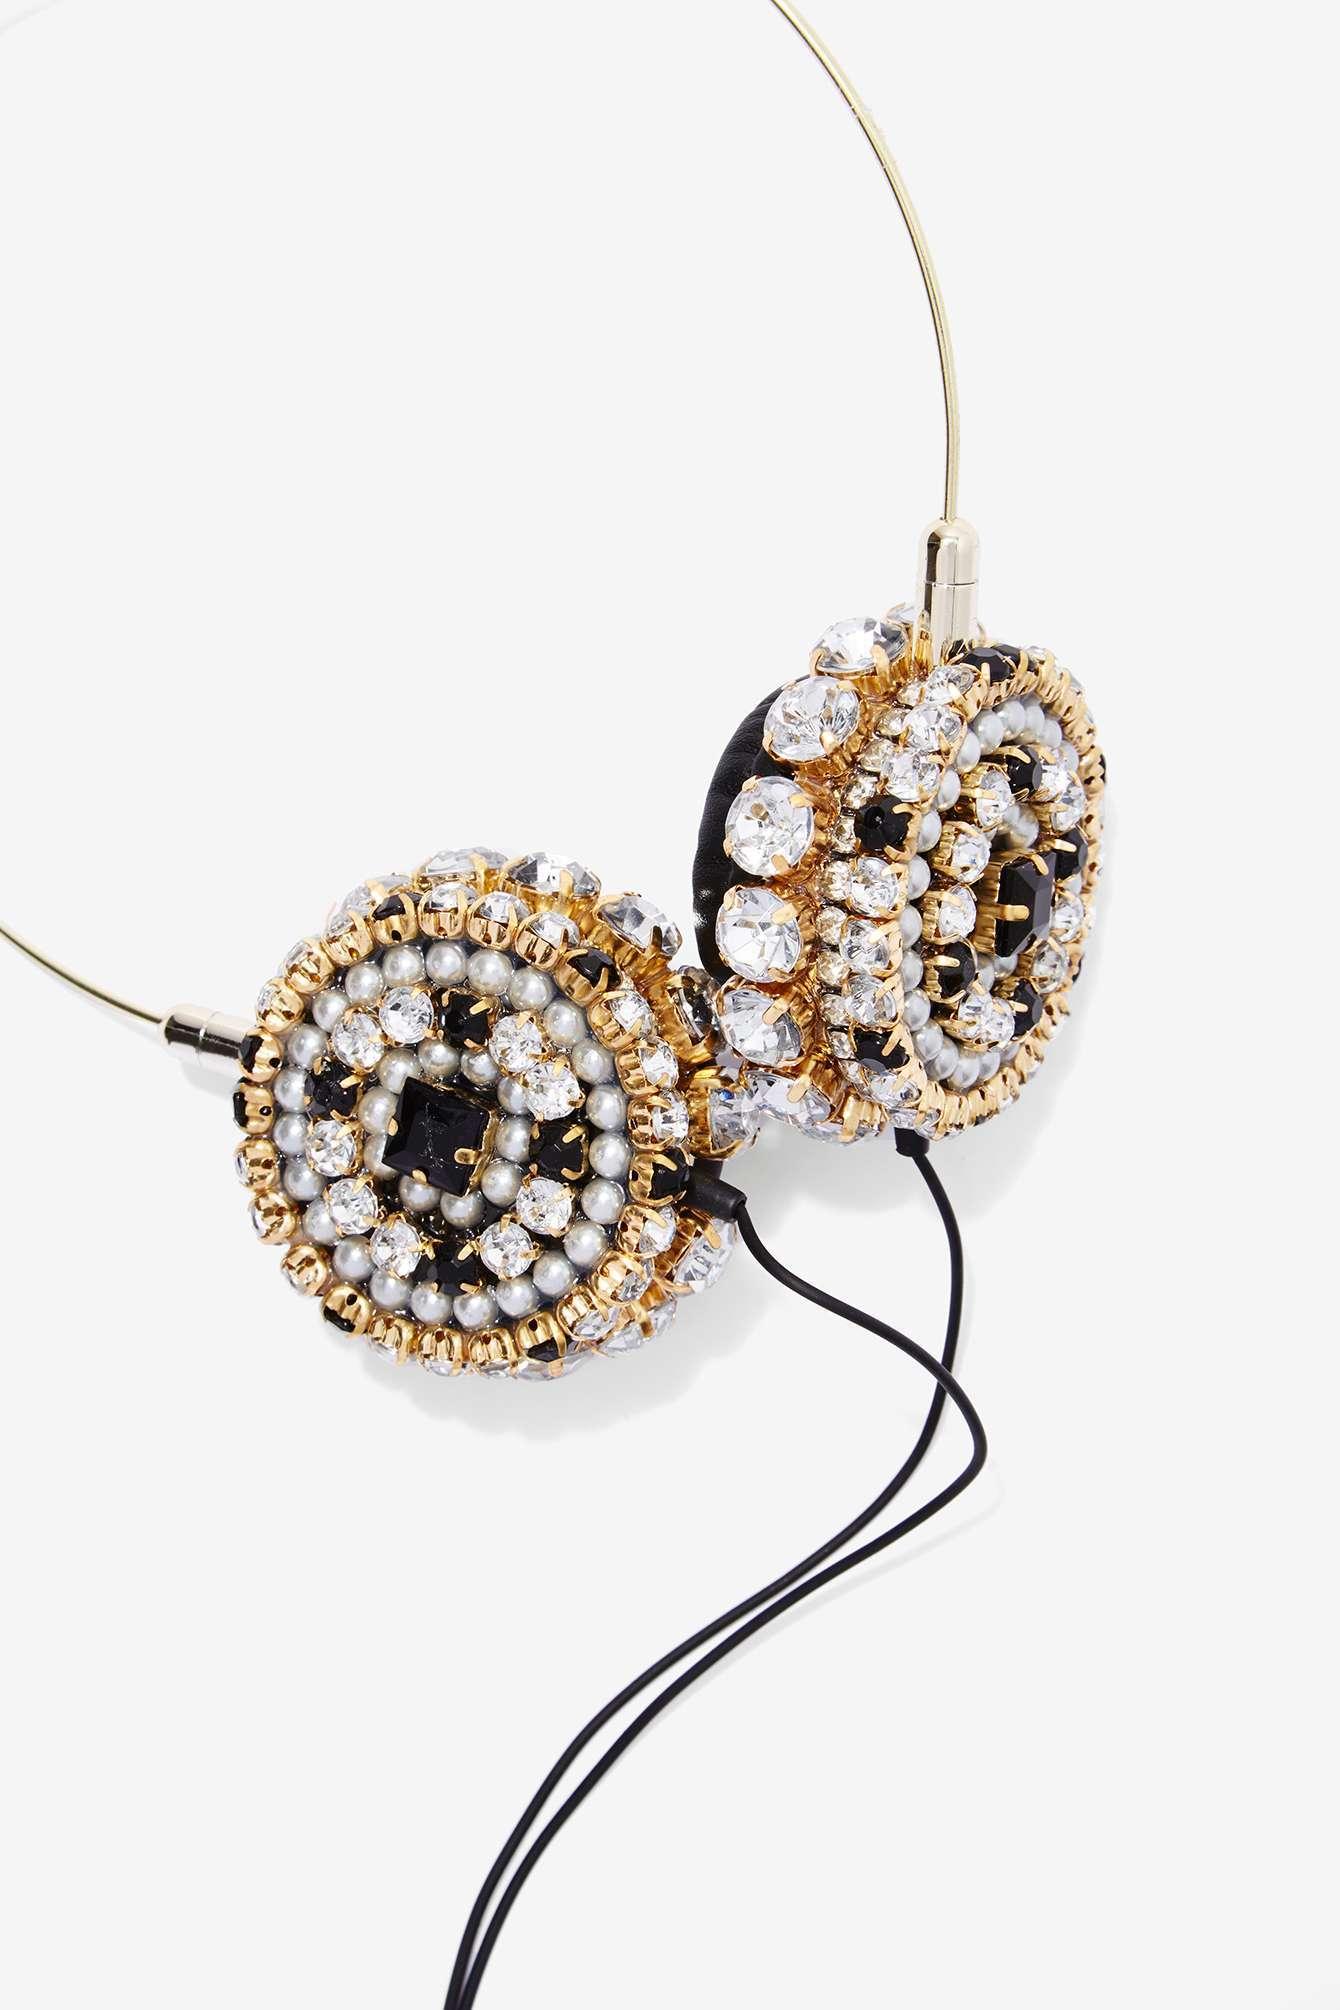 Nasty-Gal-Skinnydip London-Zara -Martin- Bling-Headphones-4